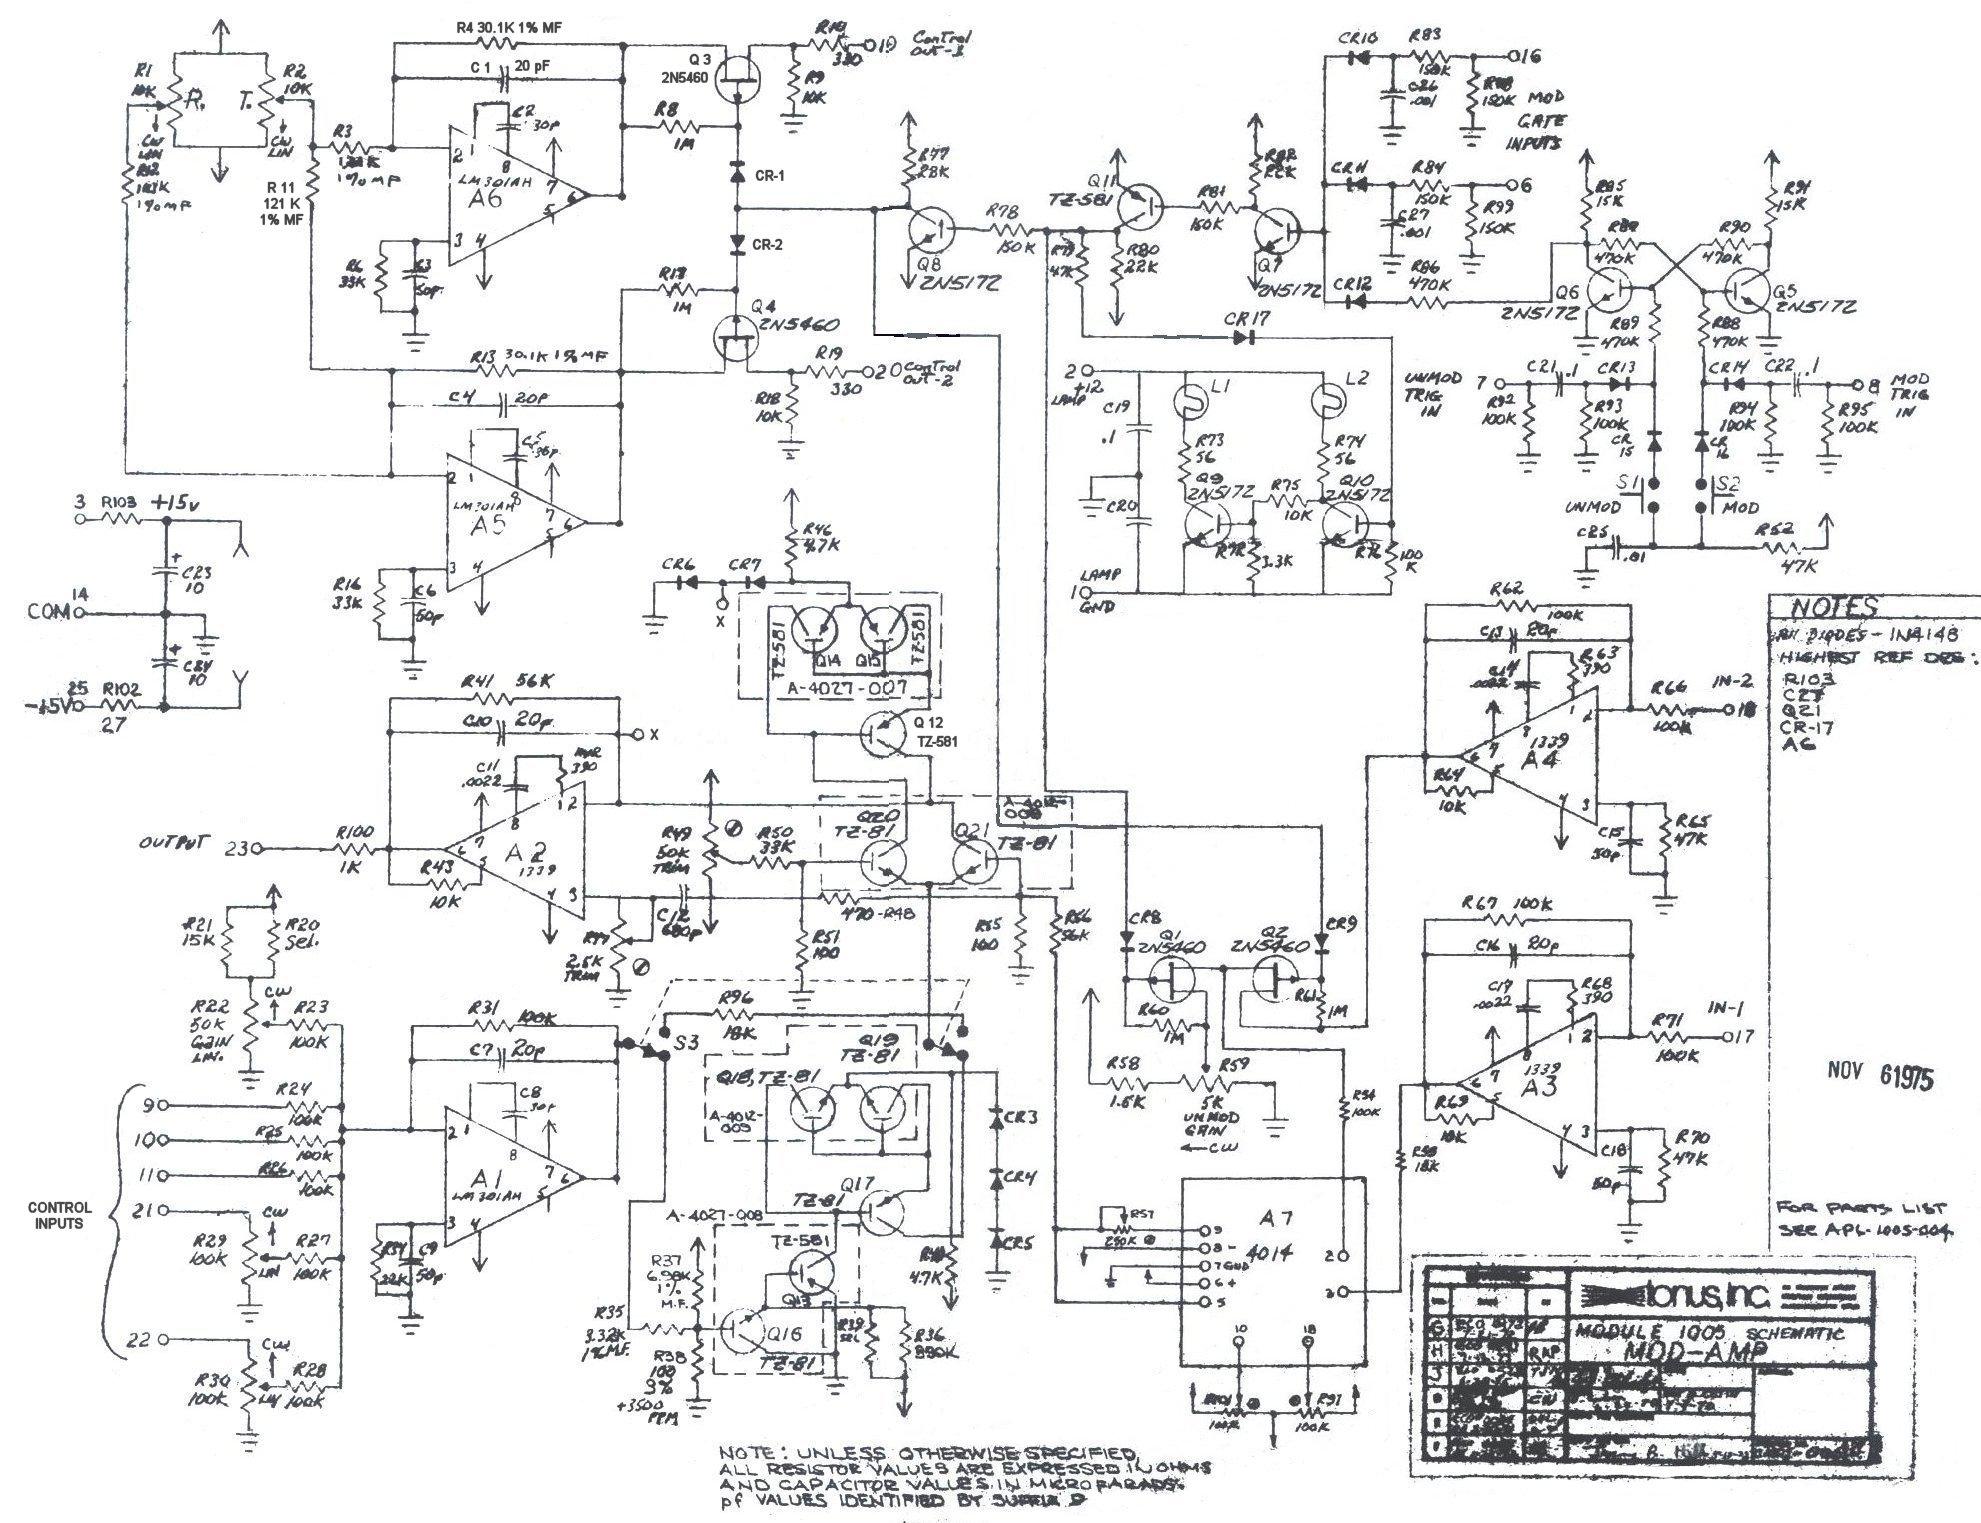 10 Watt 100 Ohm Resistor